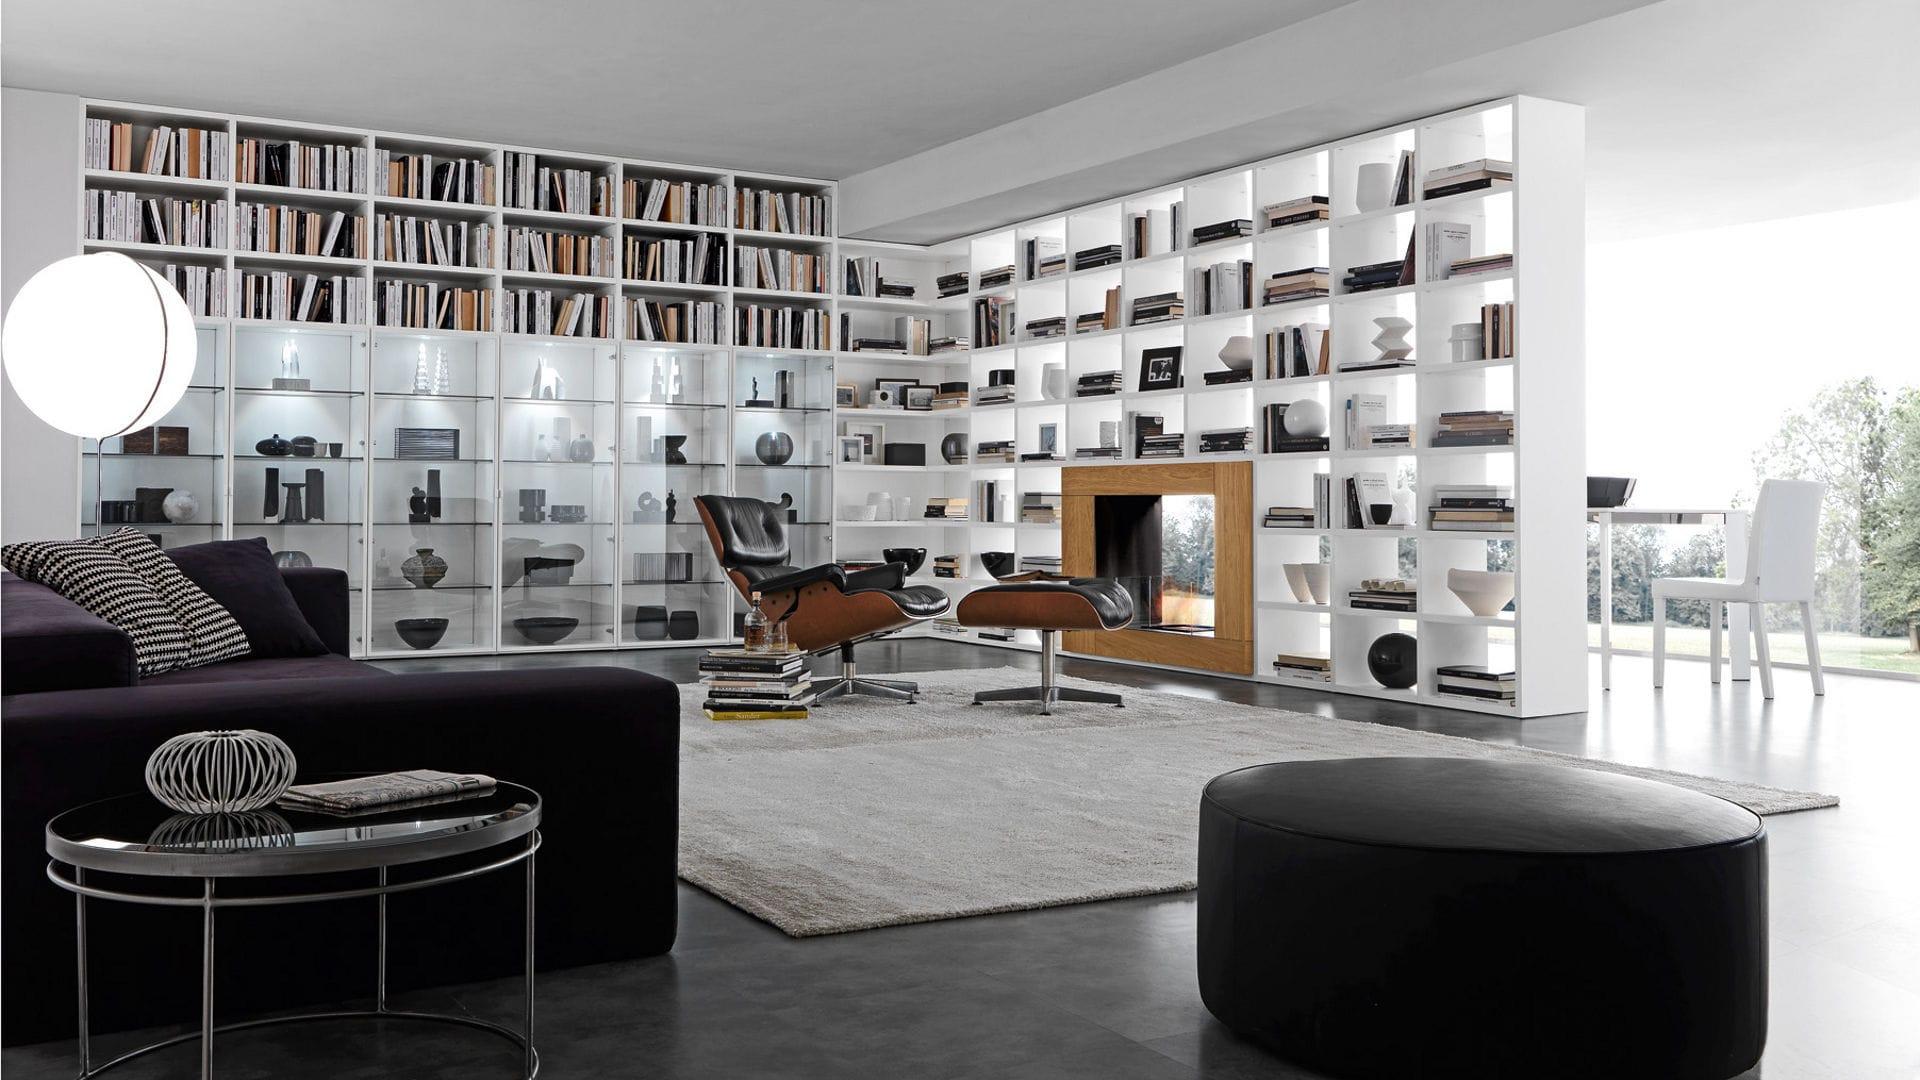 Bucherregal Systeme Presotto Highlight Wohnraum Beautiful ...